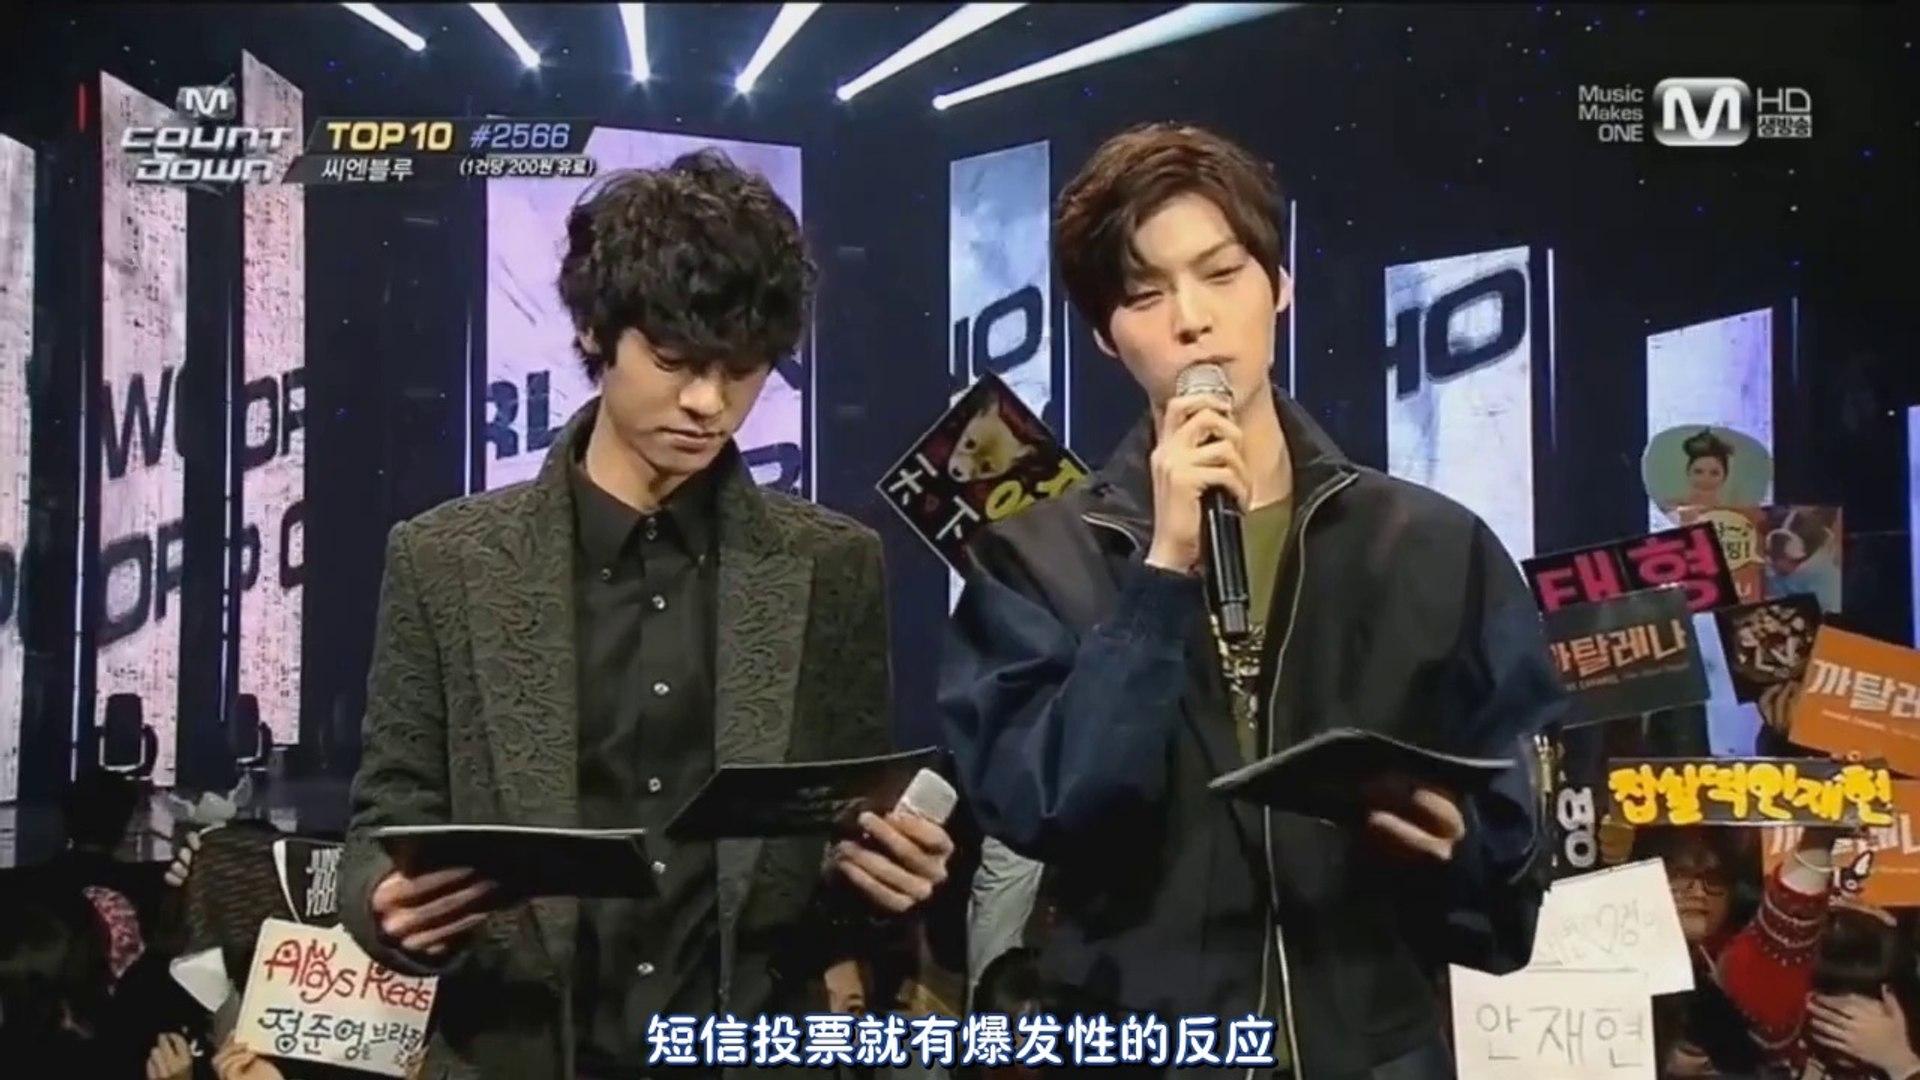 [CHN SUB] [BaiDu郑俊英吧]140313 MCD Jung Joon-young Ahn Jae-hyun MC cut 140313 MCD 郑俊英 安宰贤 MC cut